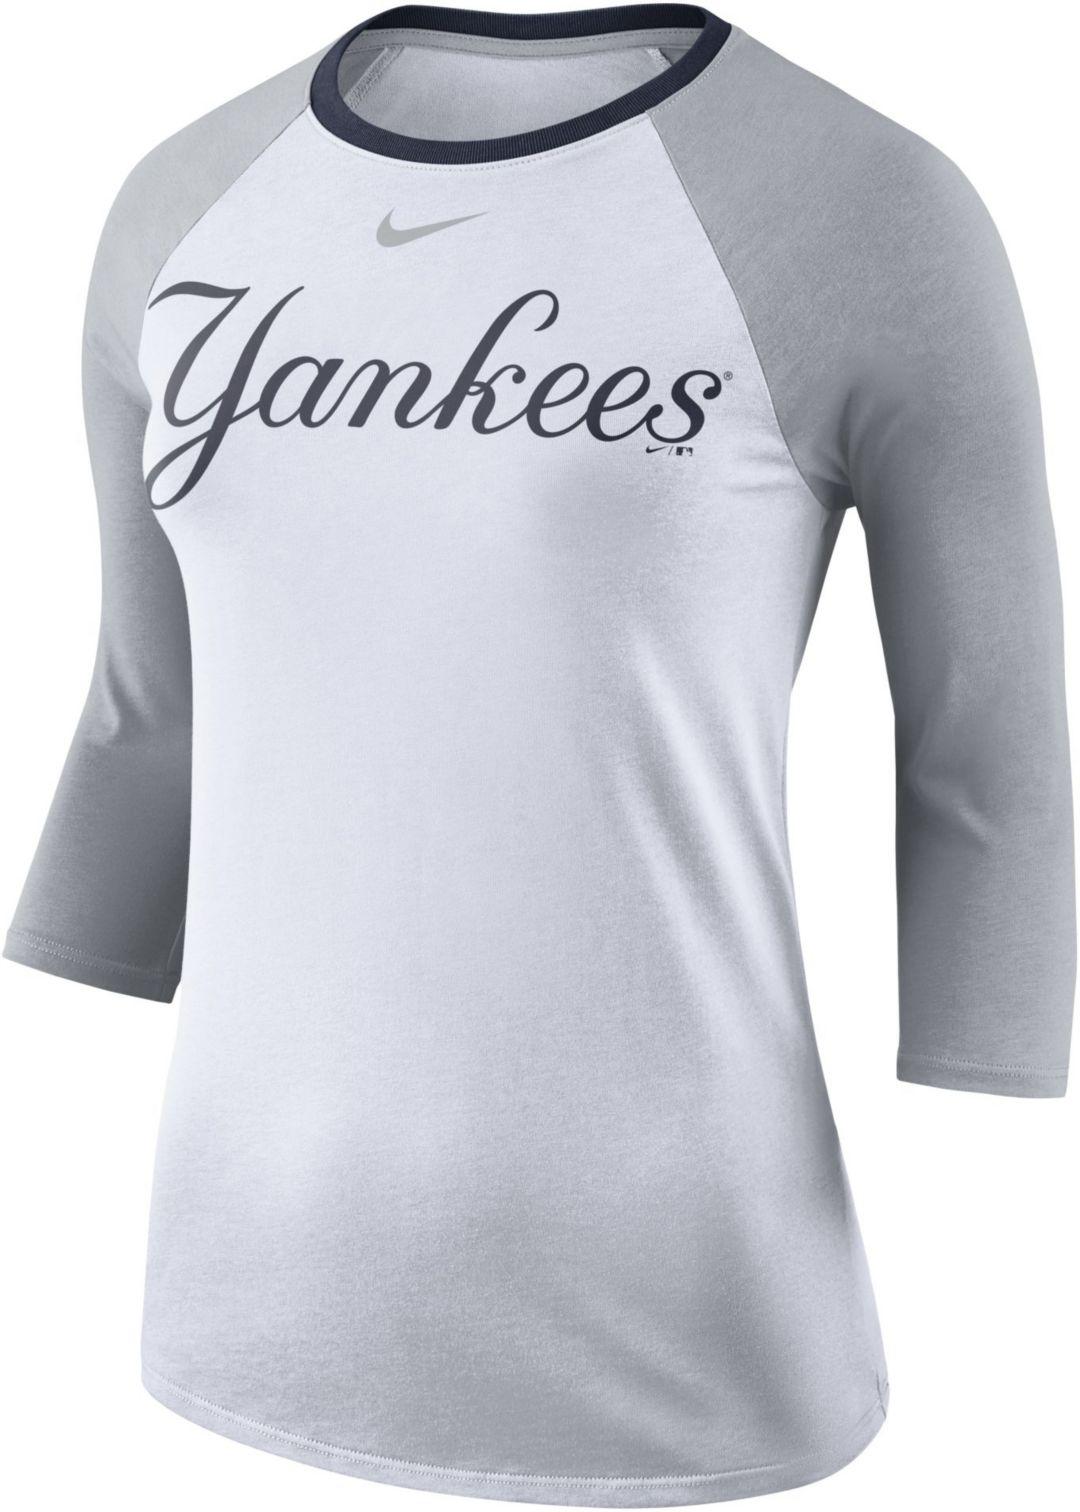 on sale b569f db444 Nike Women s New York Yankees Raglan Tri-Blend Three-Quarter Sleeve Shirt.  noImageFound. Previous